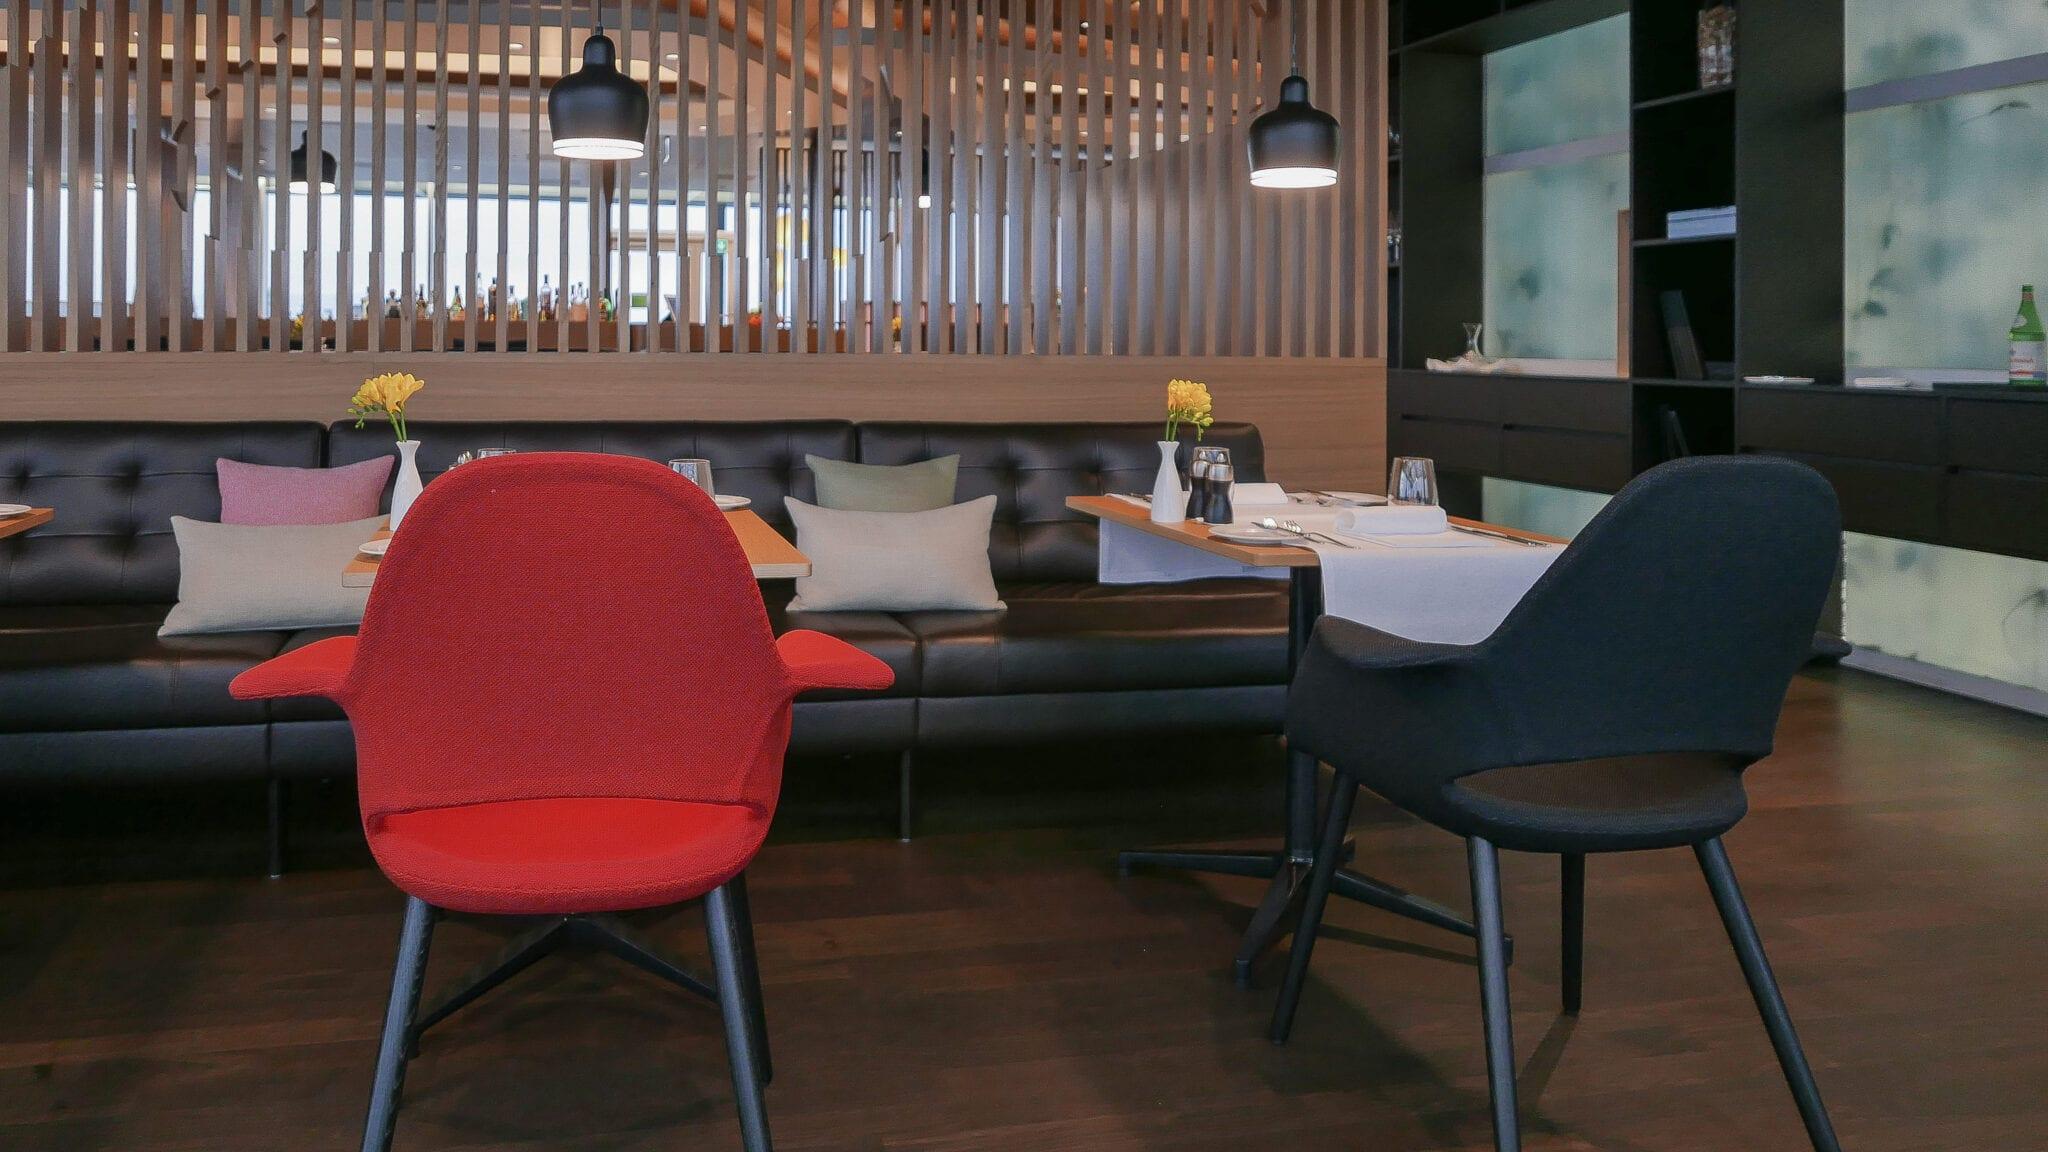 LX F ZRH E gates 19 - REVIEW - SWISS First Class Lounge - Zurich (ZRH E-Gates)